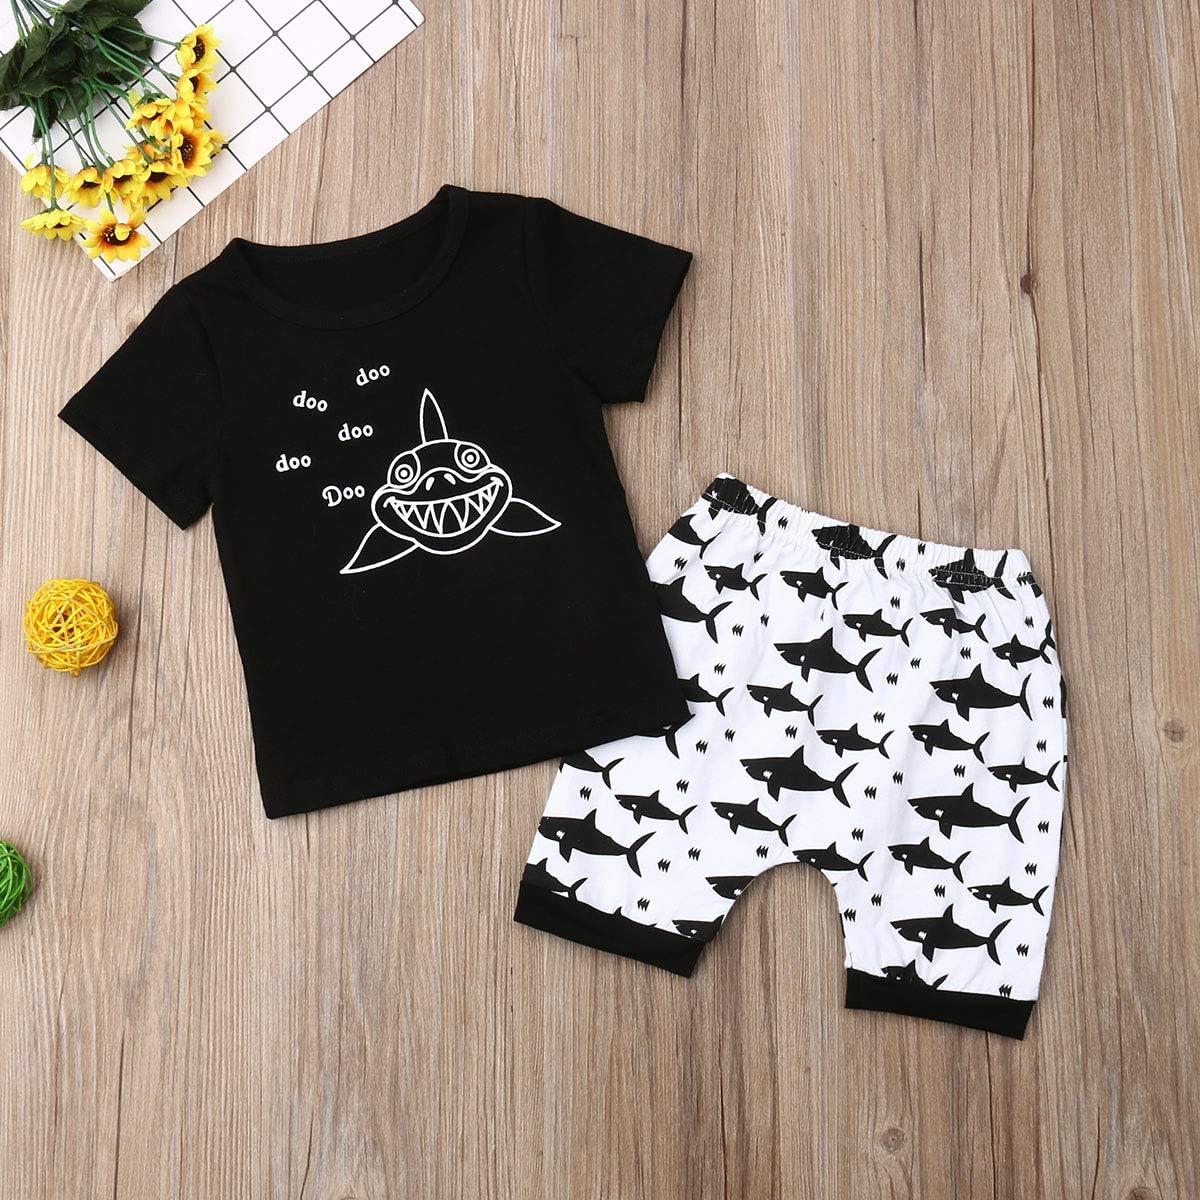 Summer Newborn Kids Clothing Baby Boys Cute Shark Vest Tank Top+Short Pants Trousers 2Pcs Outfits Clothes Set